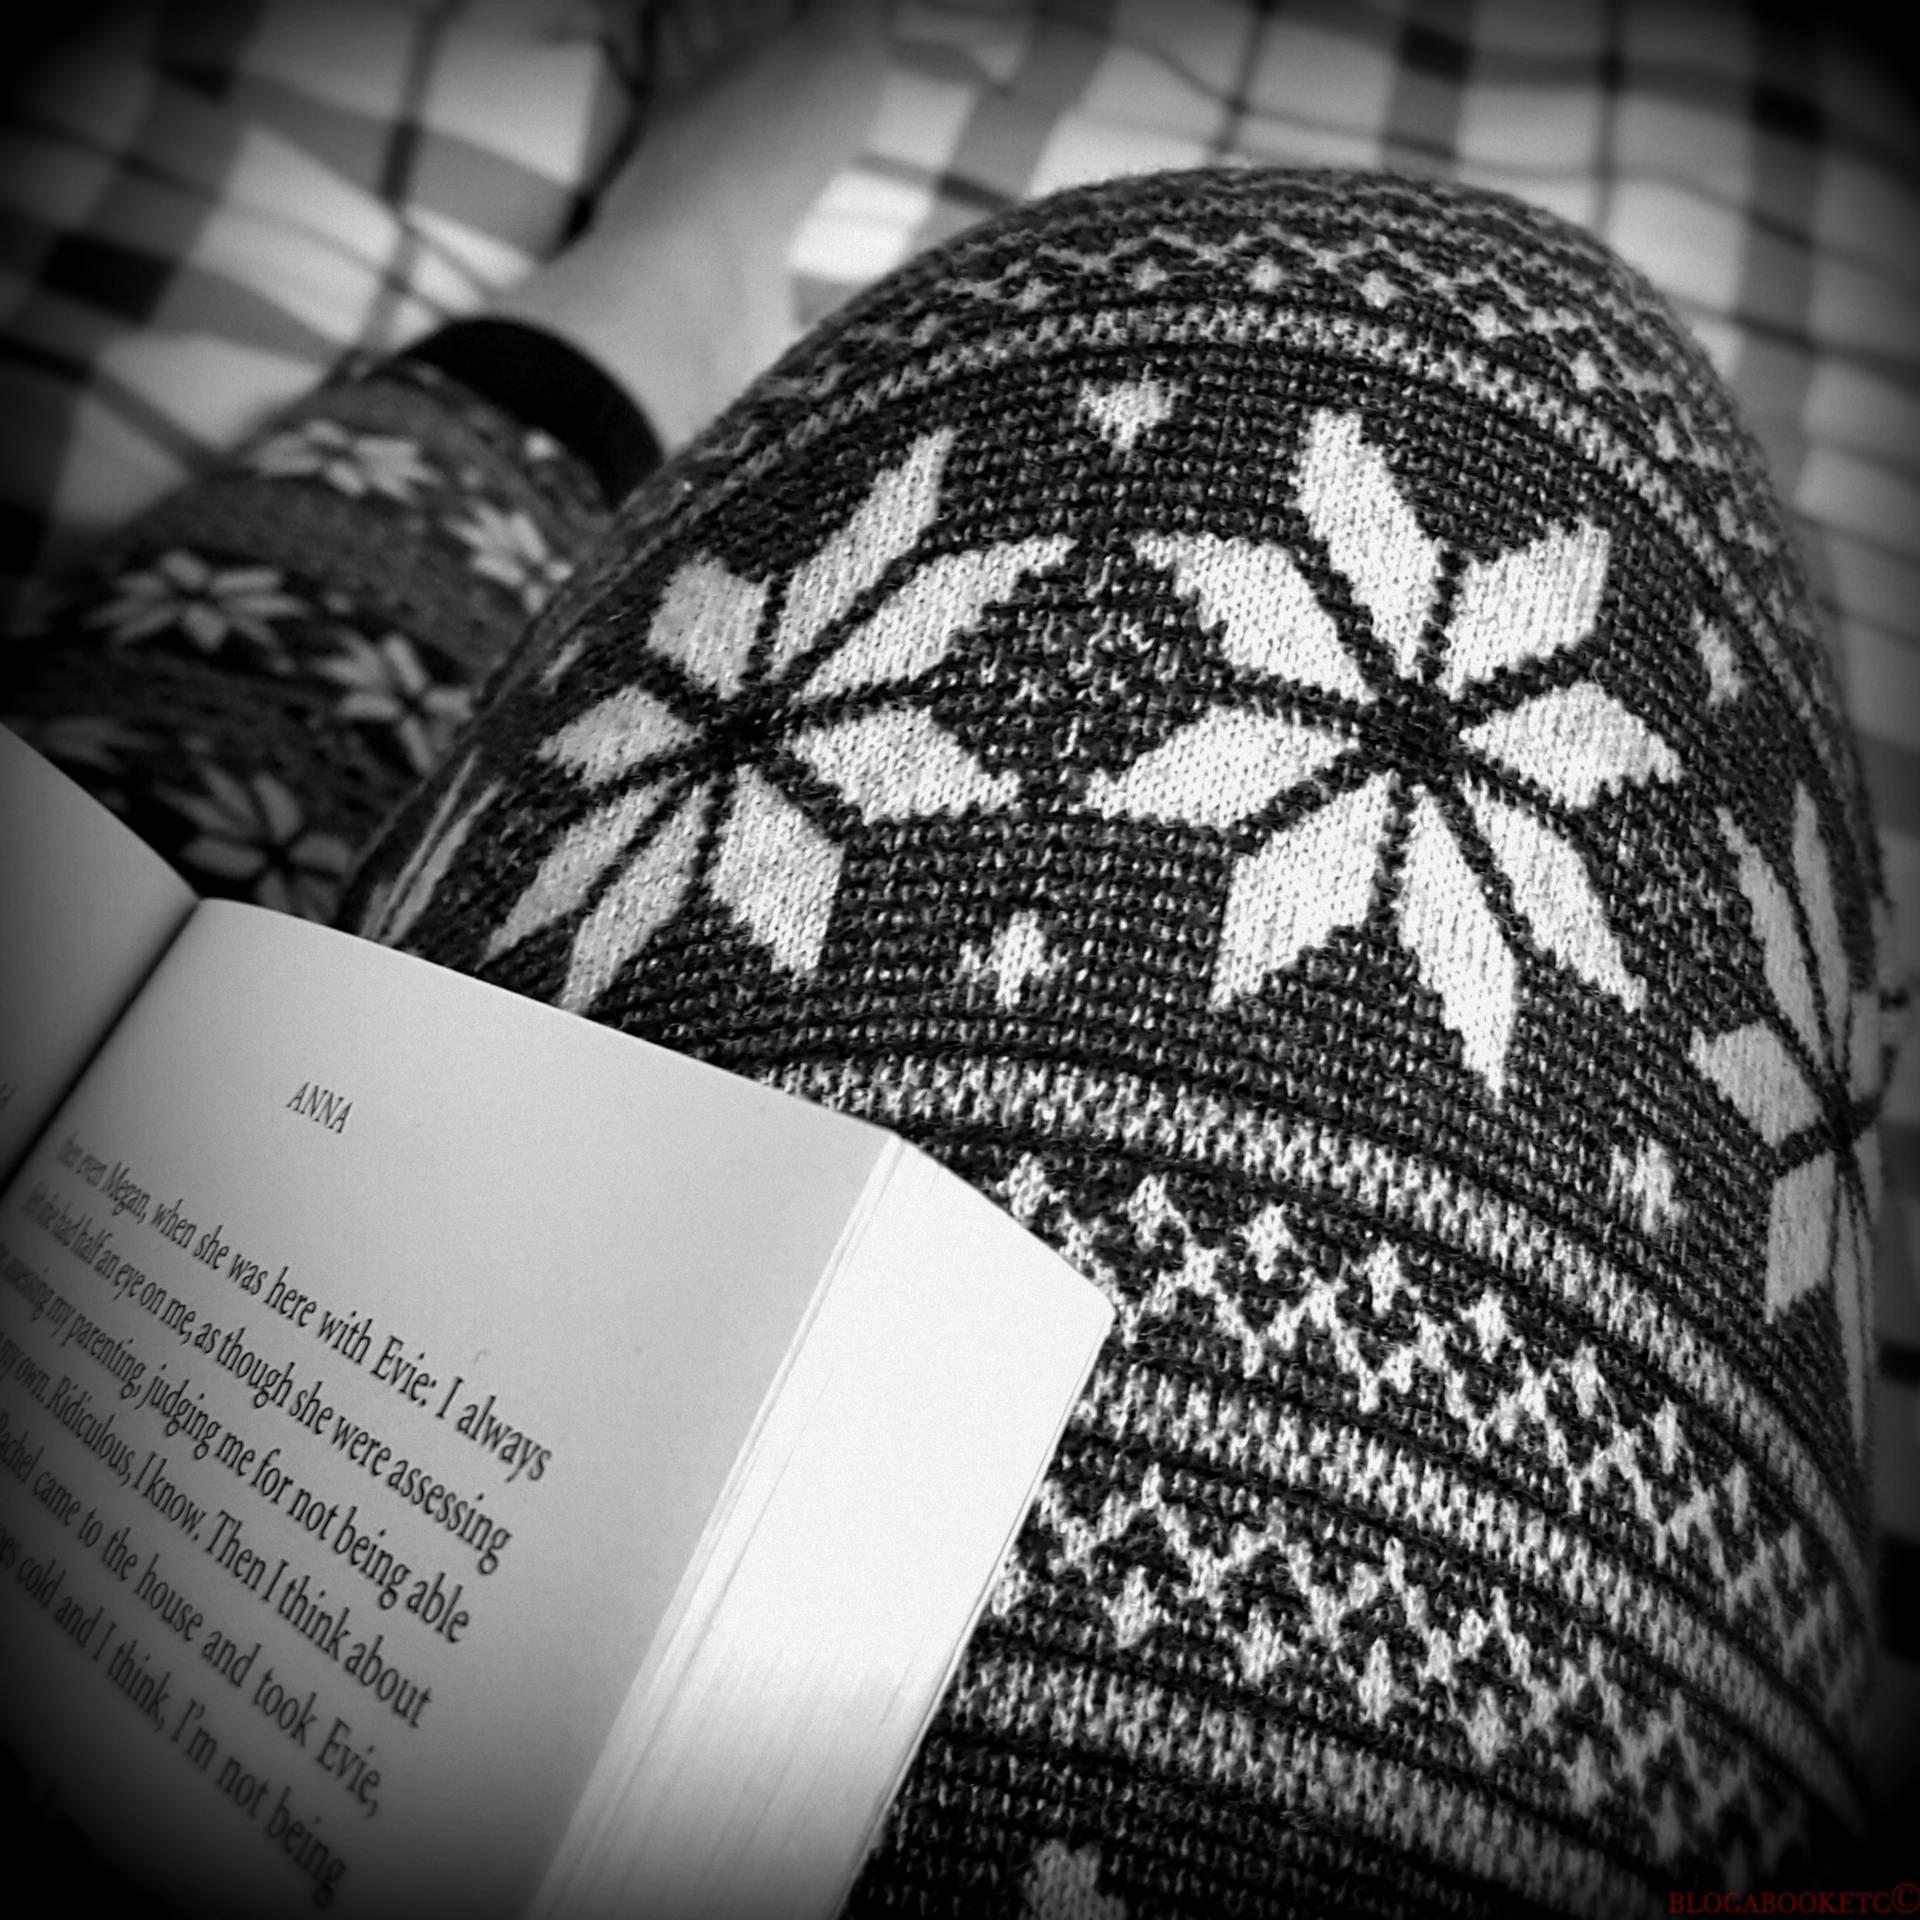 Christmas, BlogMas, Hygge, It's BlogMas, Blogger, Life, Festive Season, Christmas Time, Cold, Winter, Blog A Book Etc, Fay